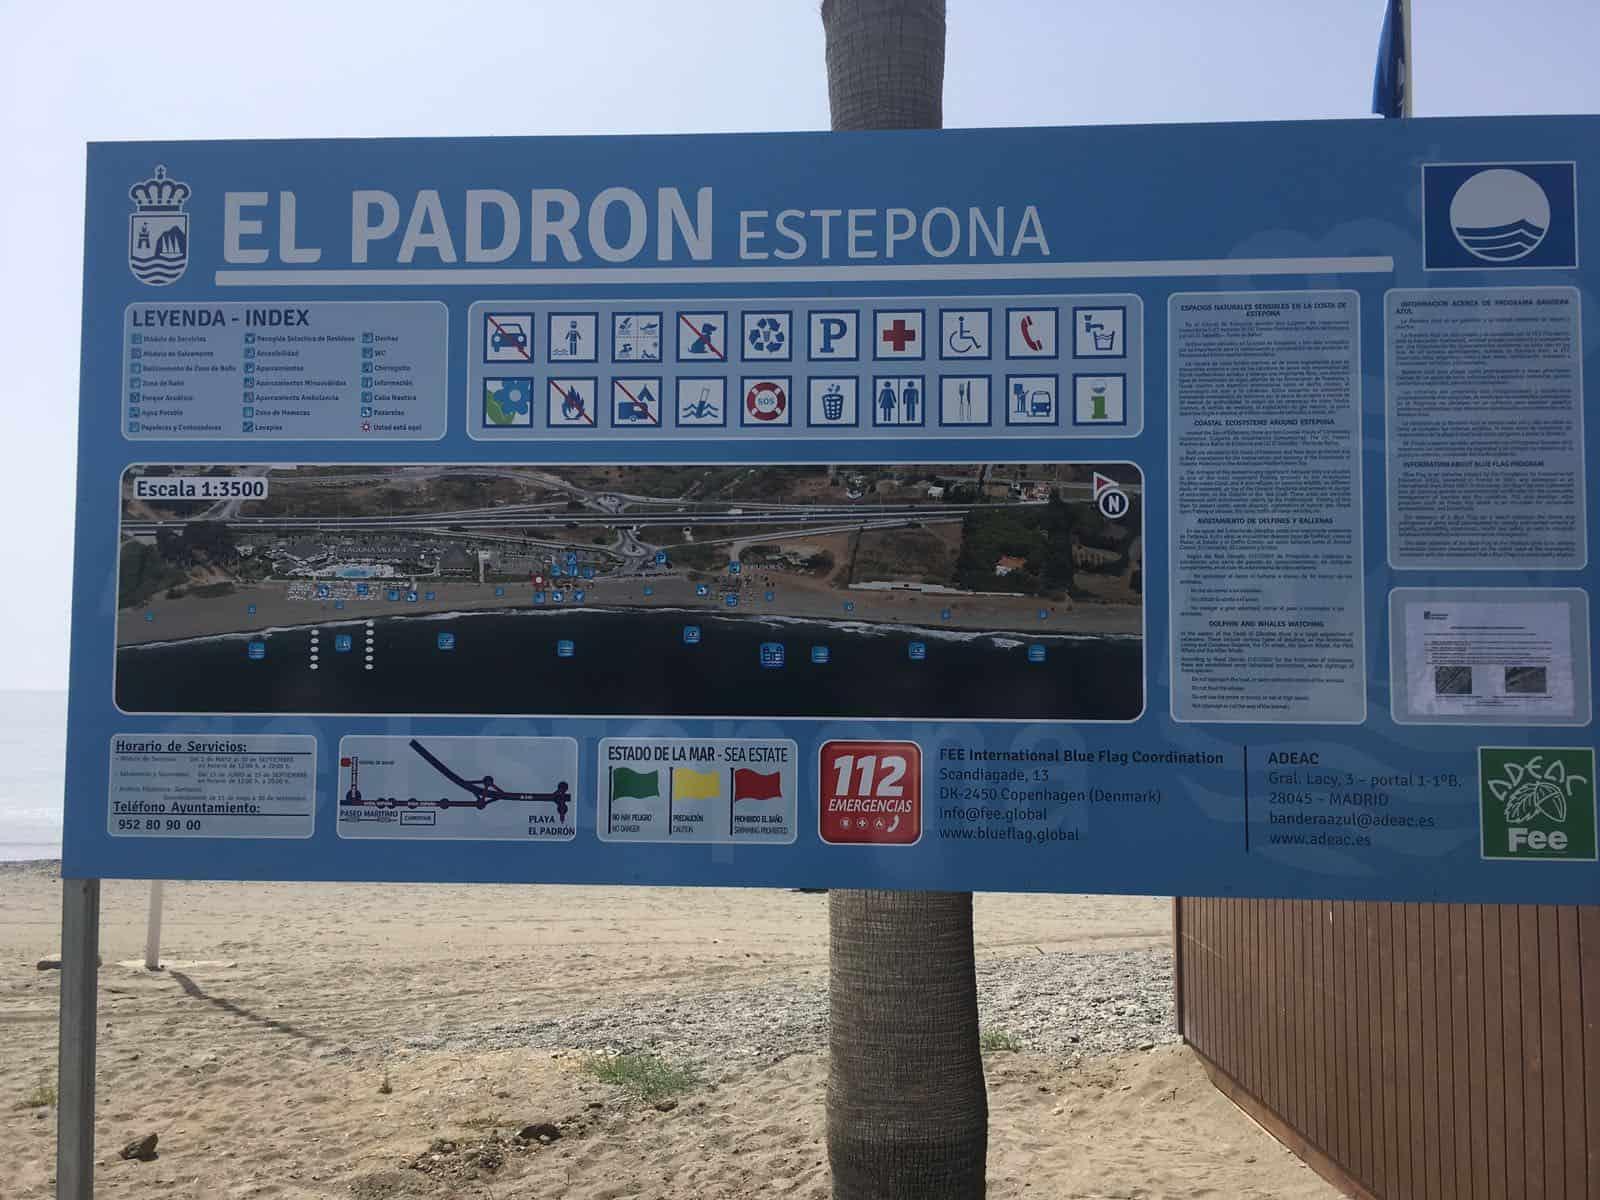 Playa El Padron